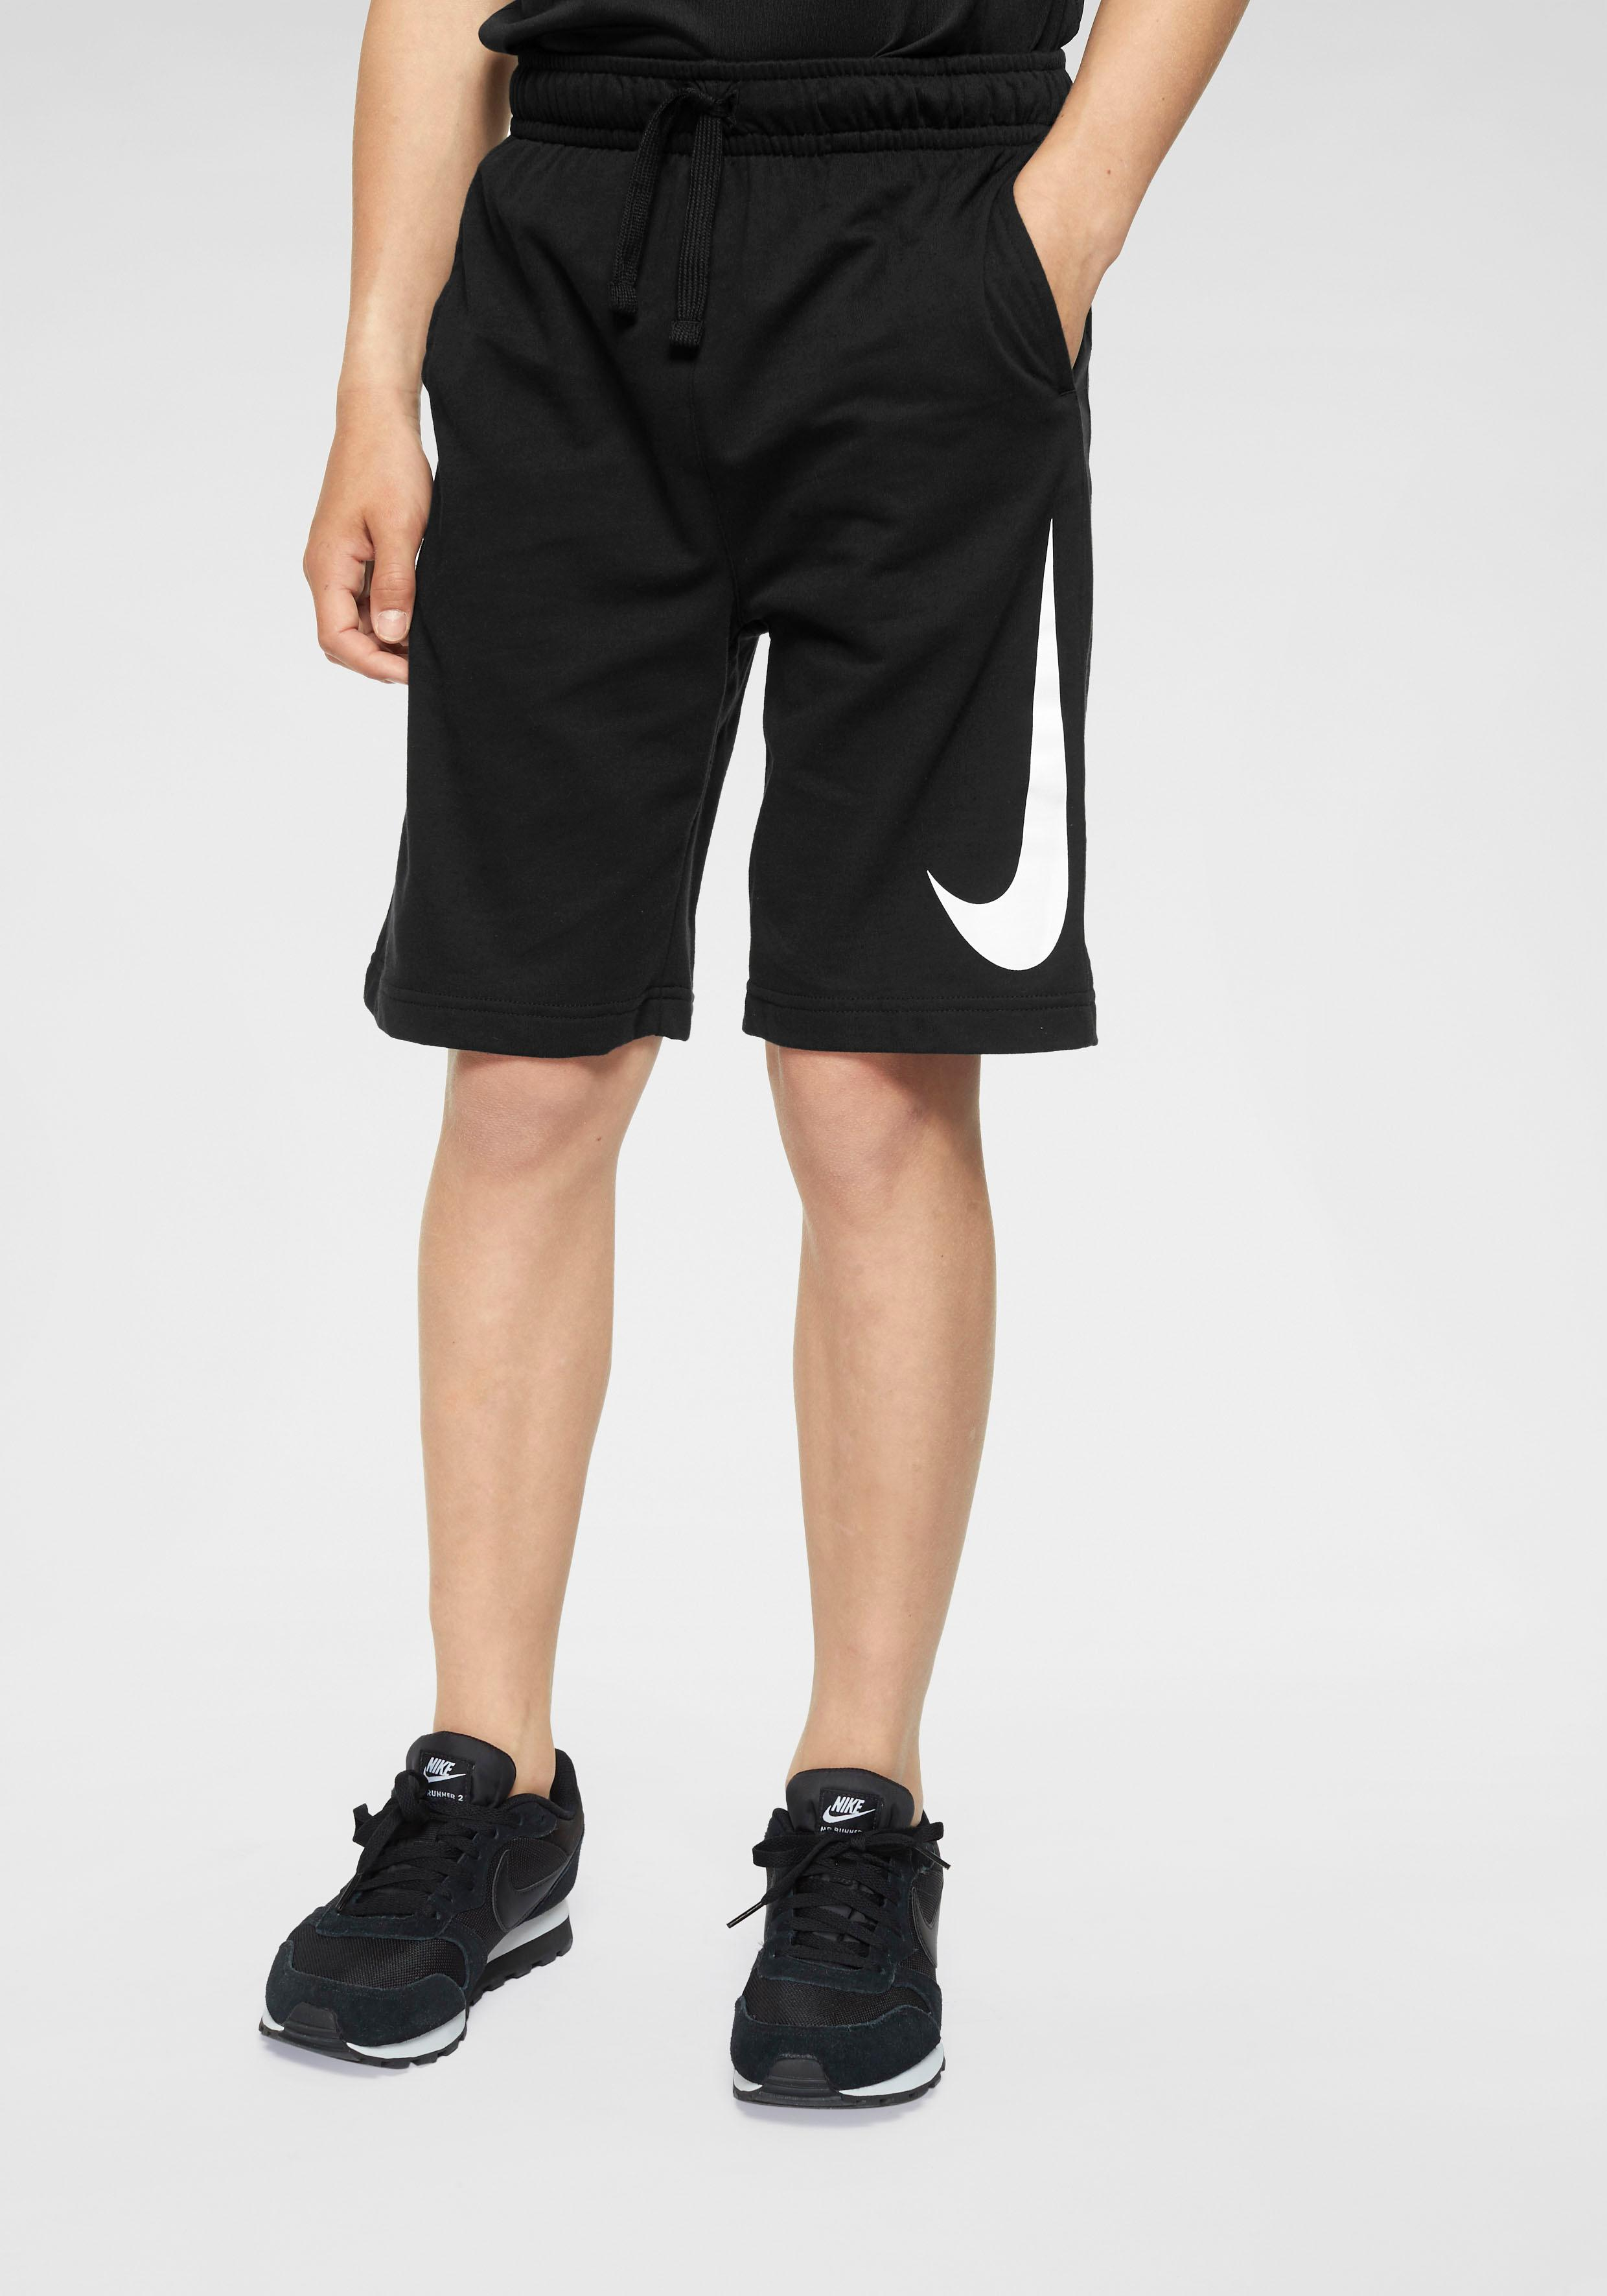 Nike Sportswear Shorts BOYS NIKE SPORTSWEAR SWOOSH SHORT | Bekleidung > Shorts & Bermudas > Shorts | Schwarz | Nike Sportswear